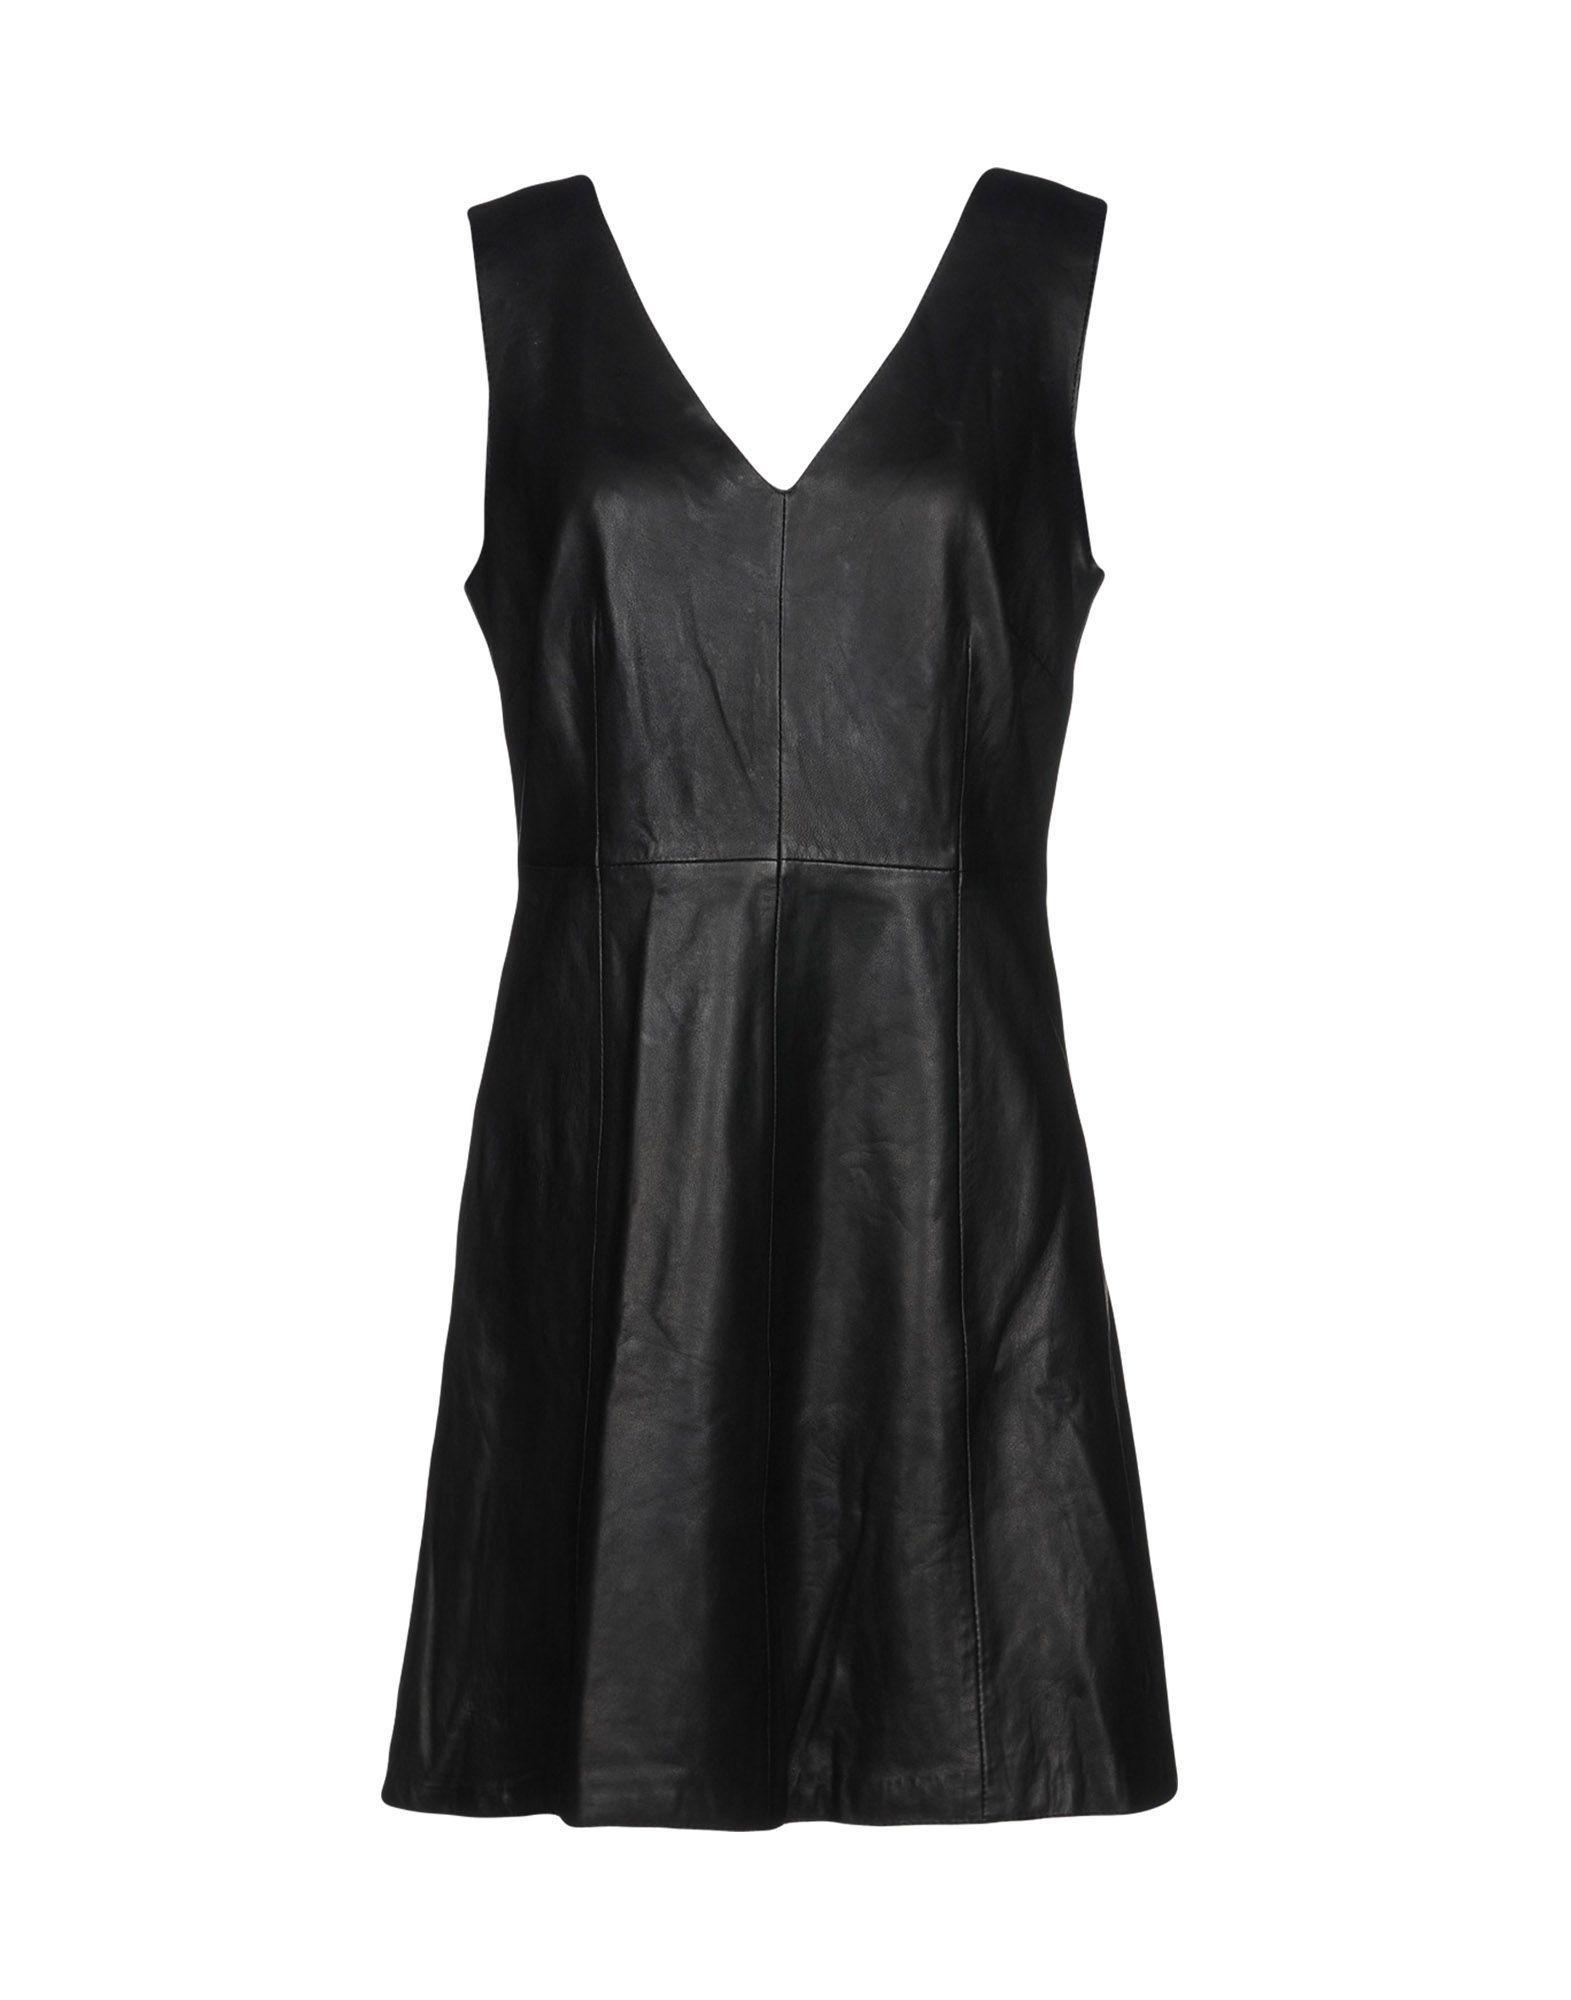 Low Price Sale DRESSES - Short dresses Muubaa Supply Online Store Online sT95CIwj37